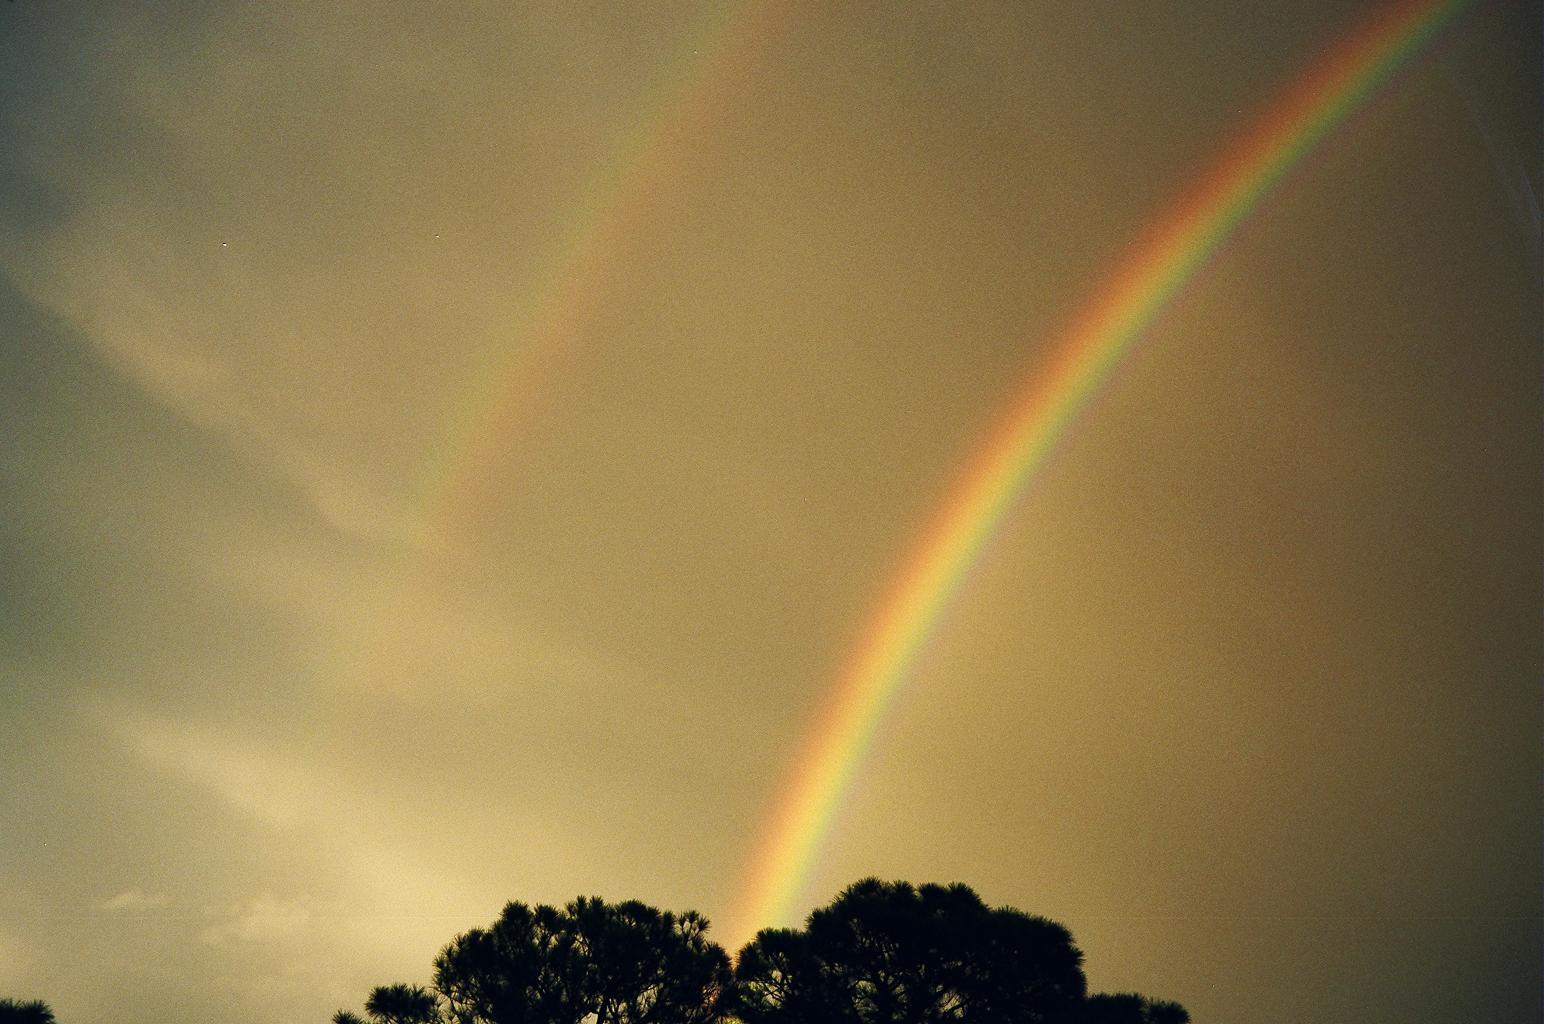 Double Rainbow in Florida